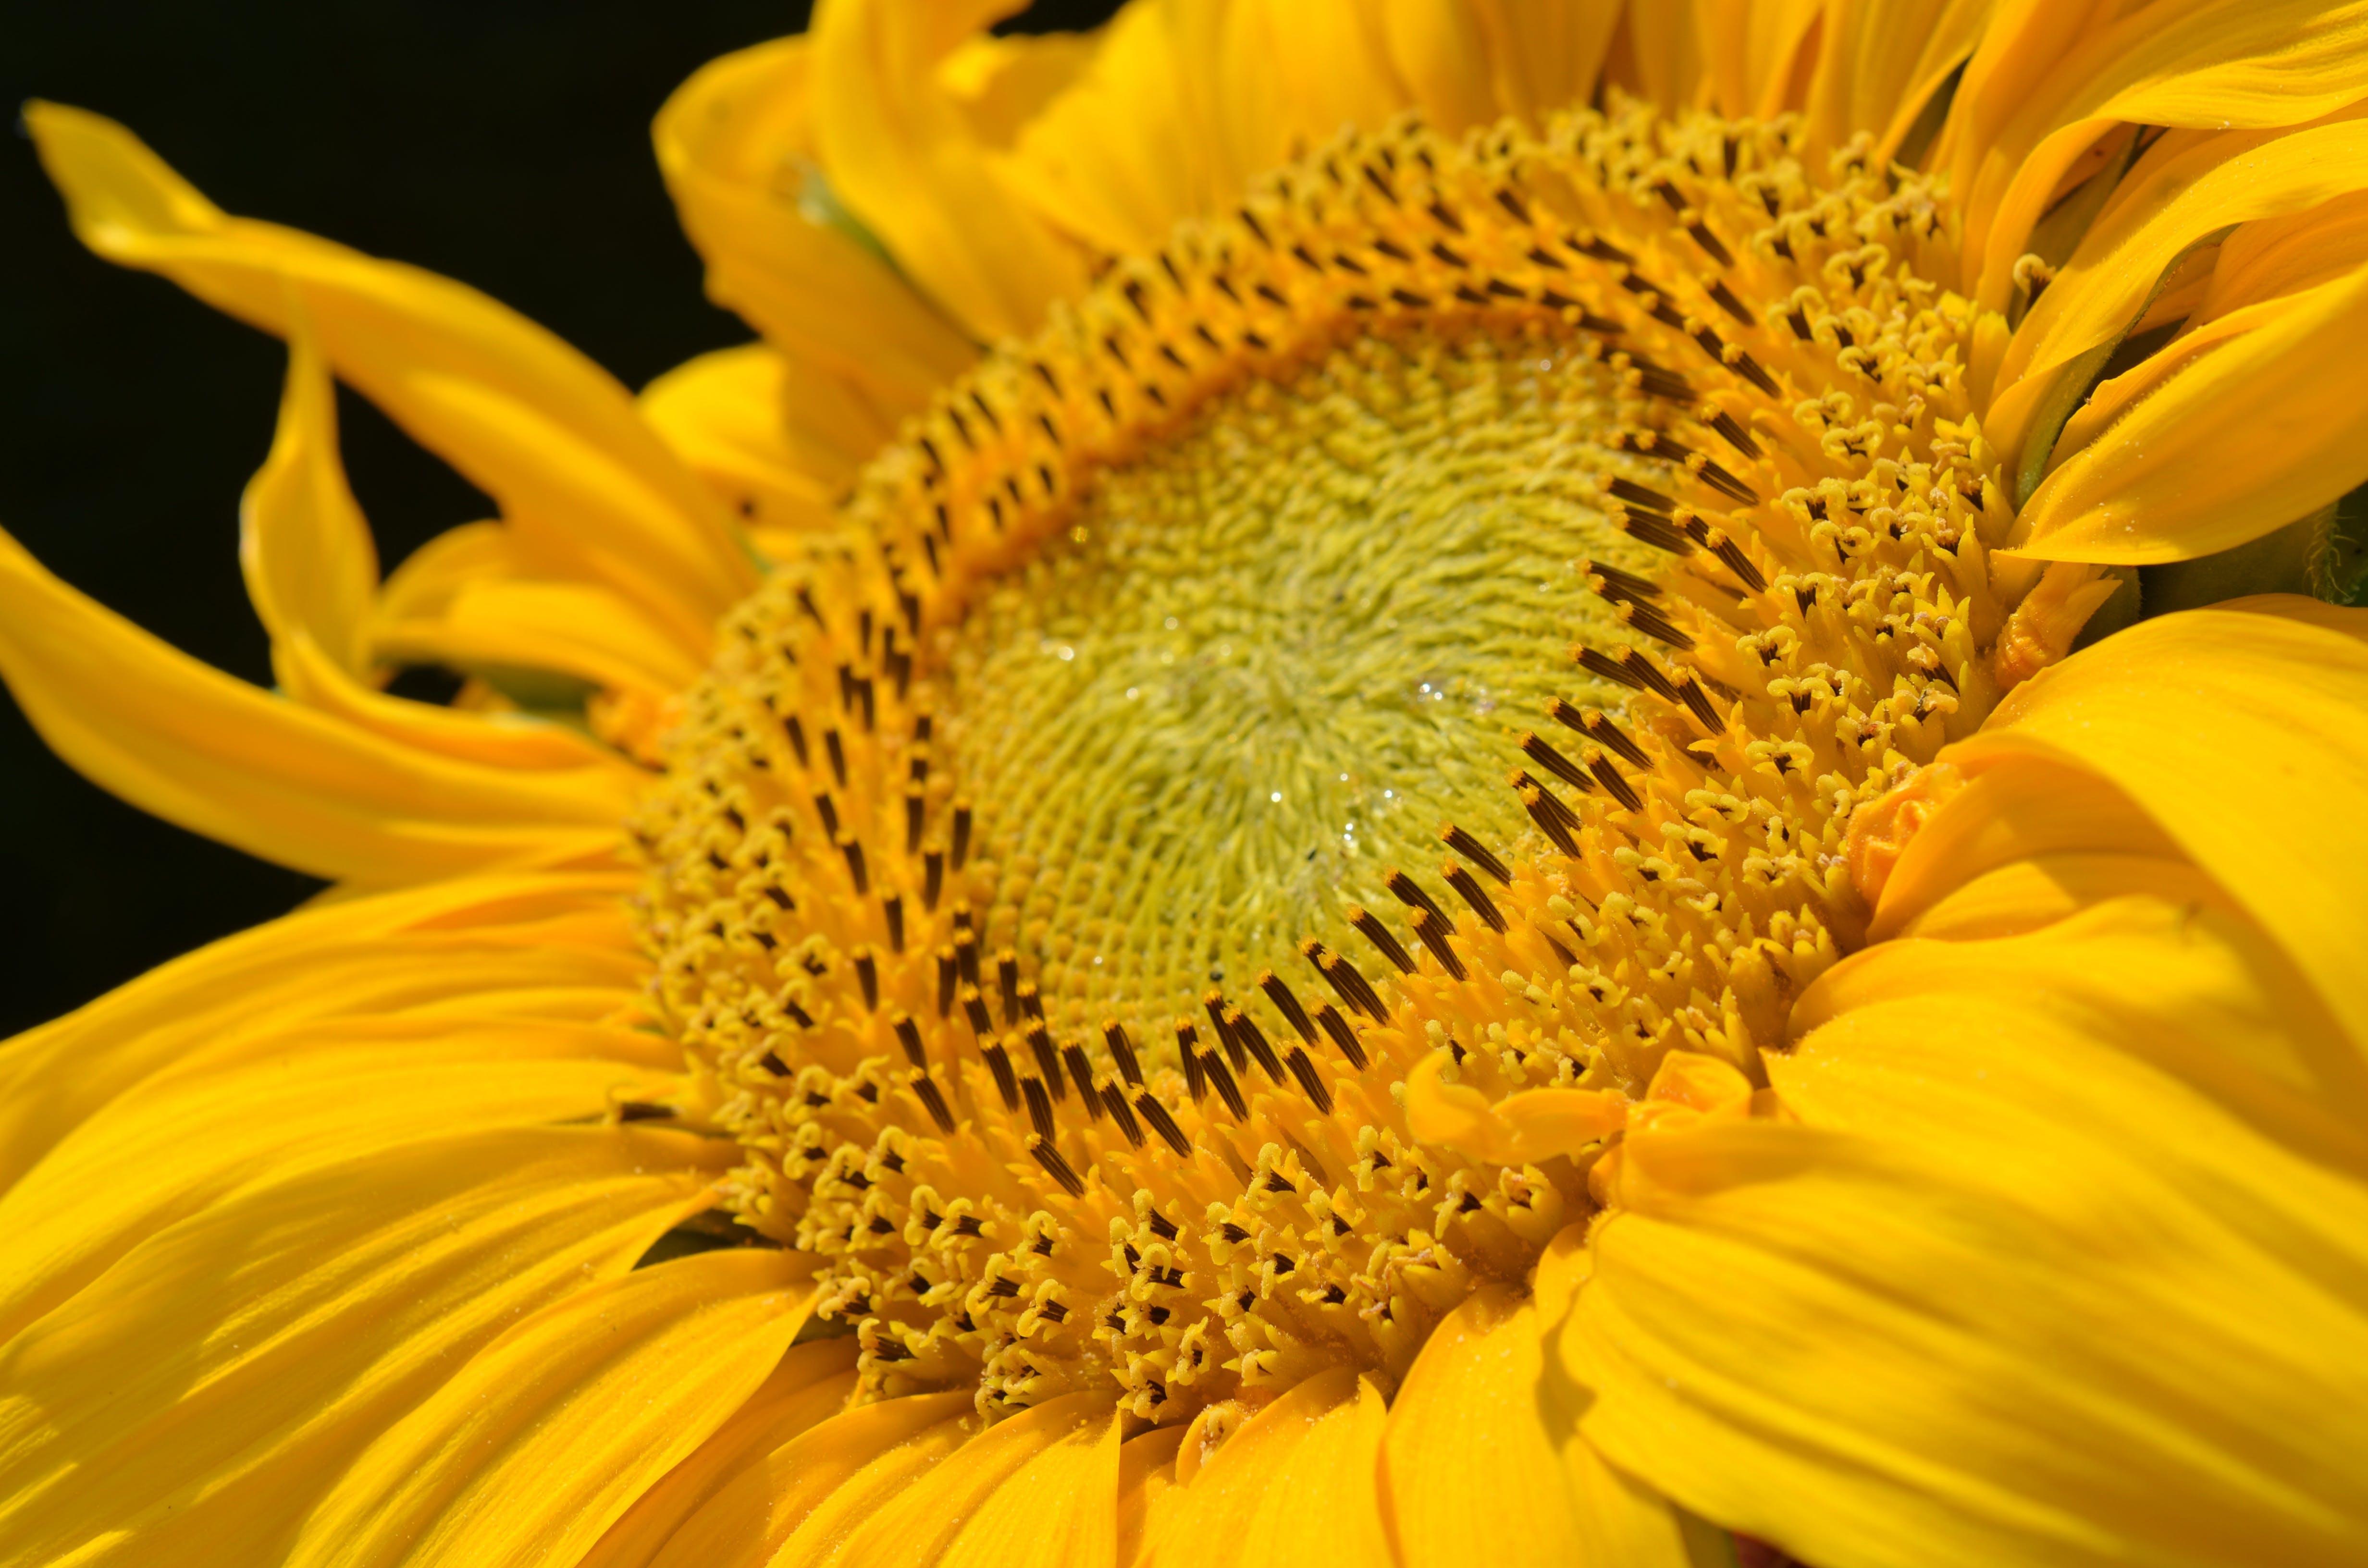 Shallow Focus of Sunflower